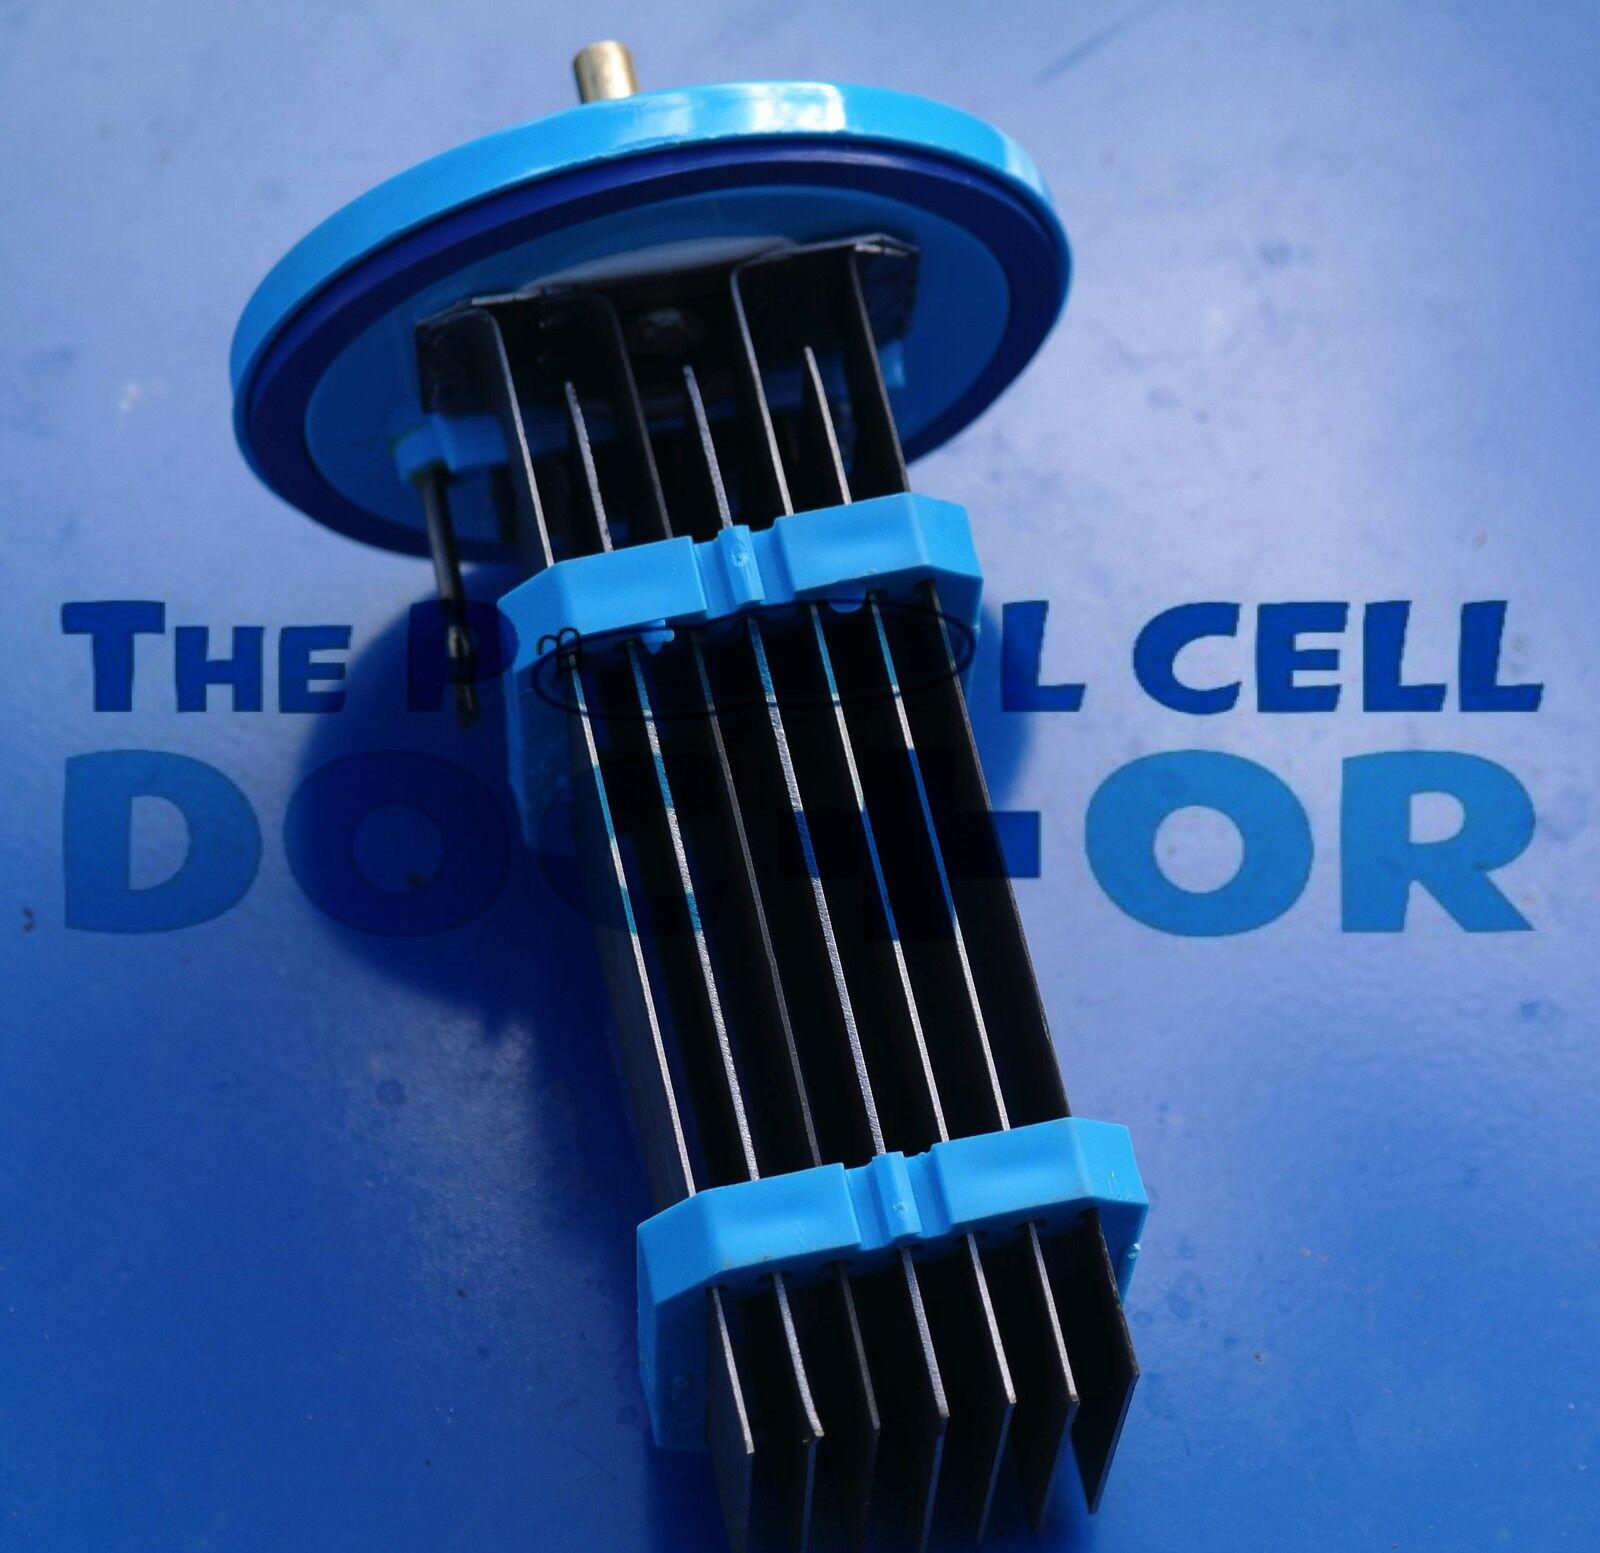 Célula de sal autoclear A250TL piscina electrodo genérico 2y Wty inversa EXTRA LIFE